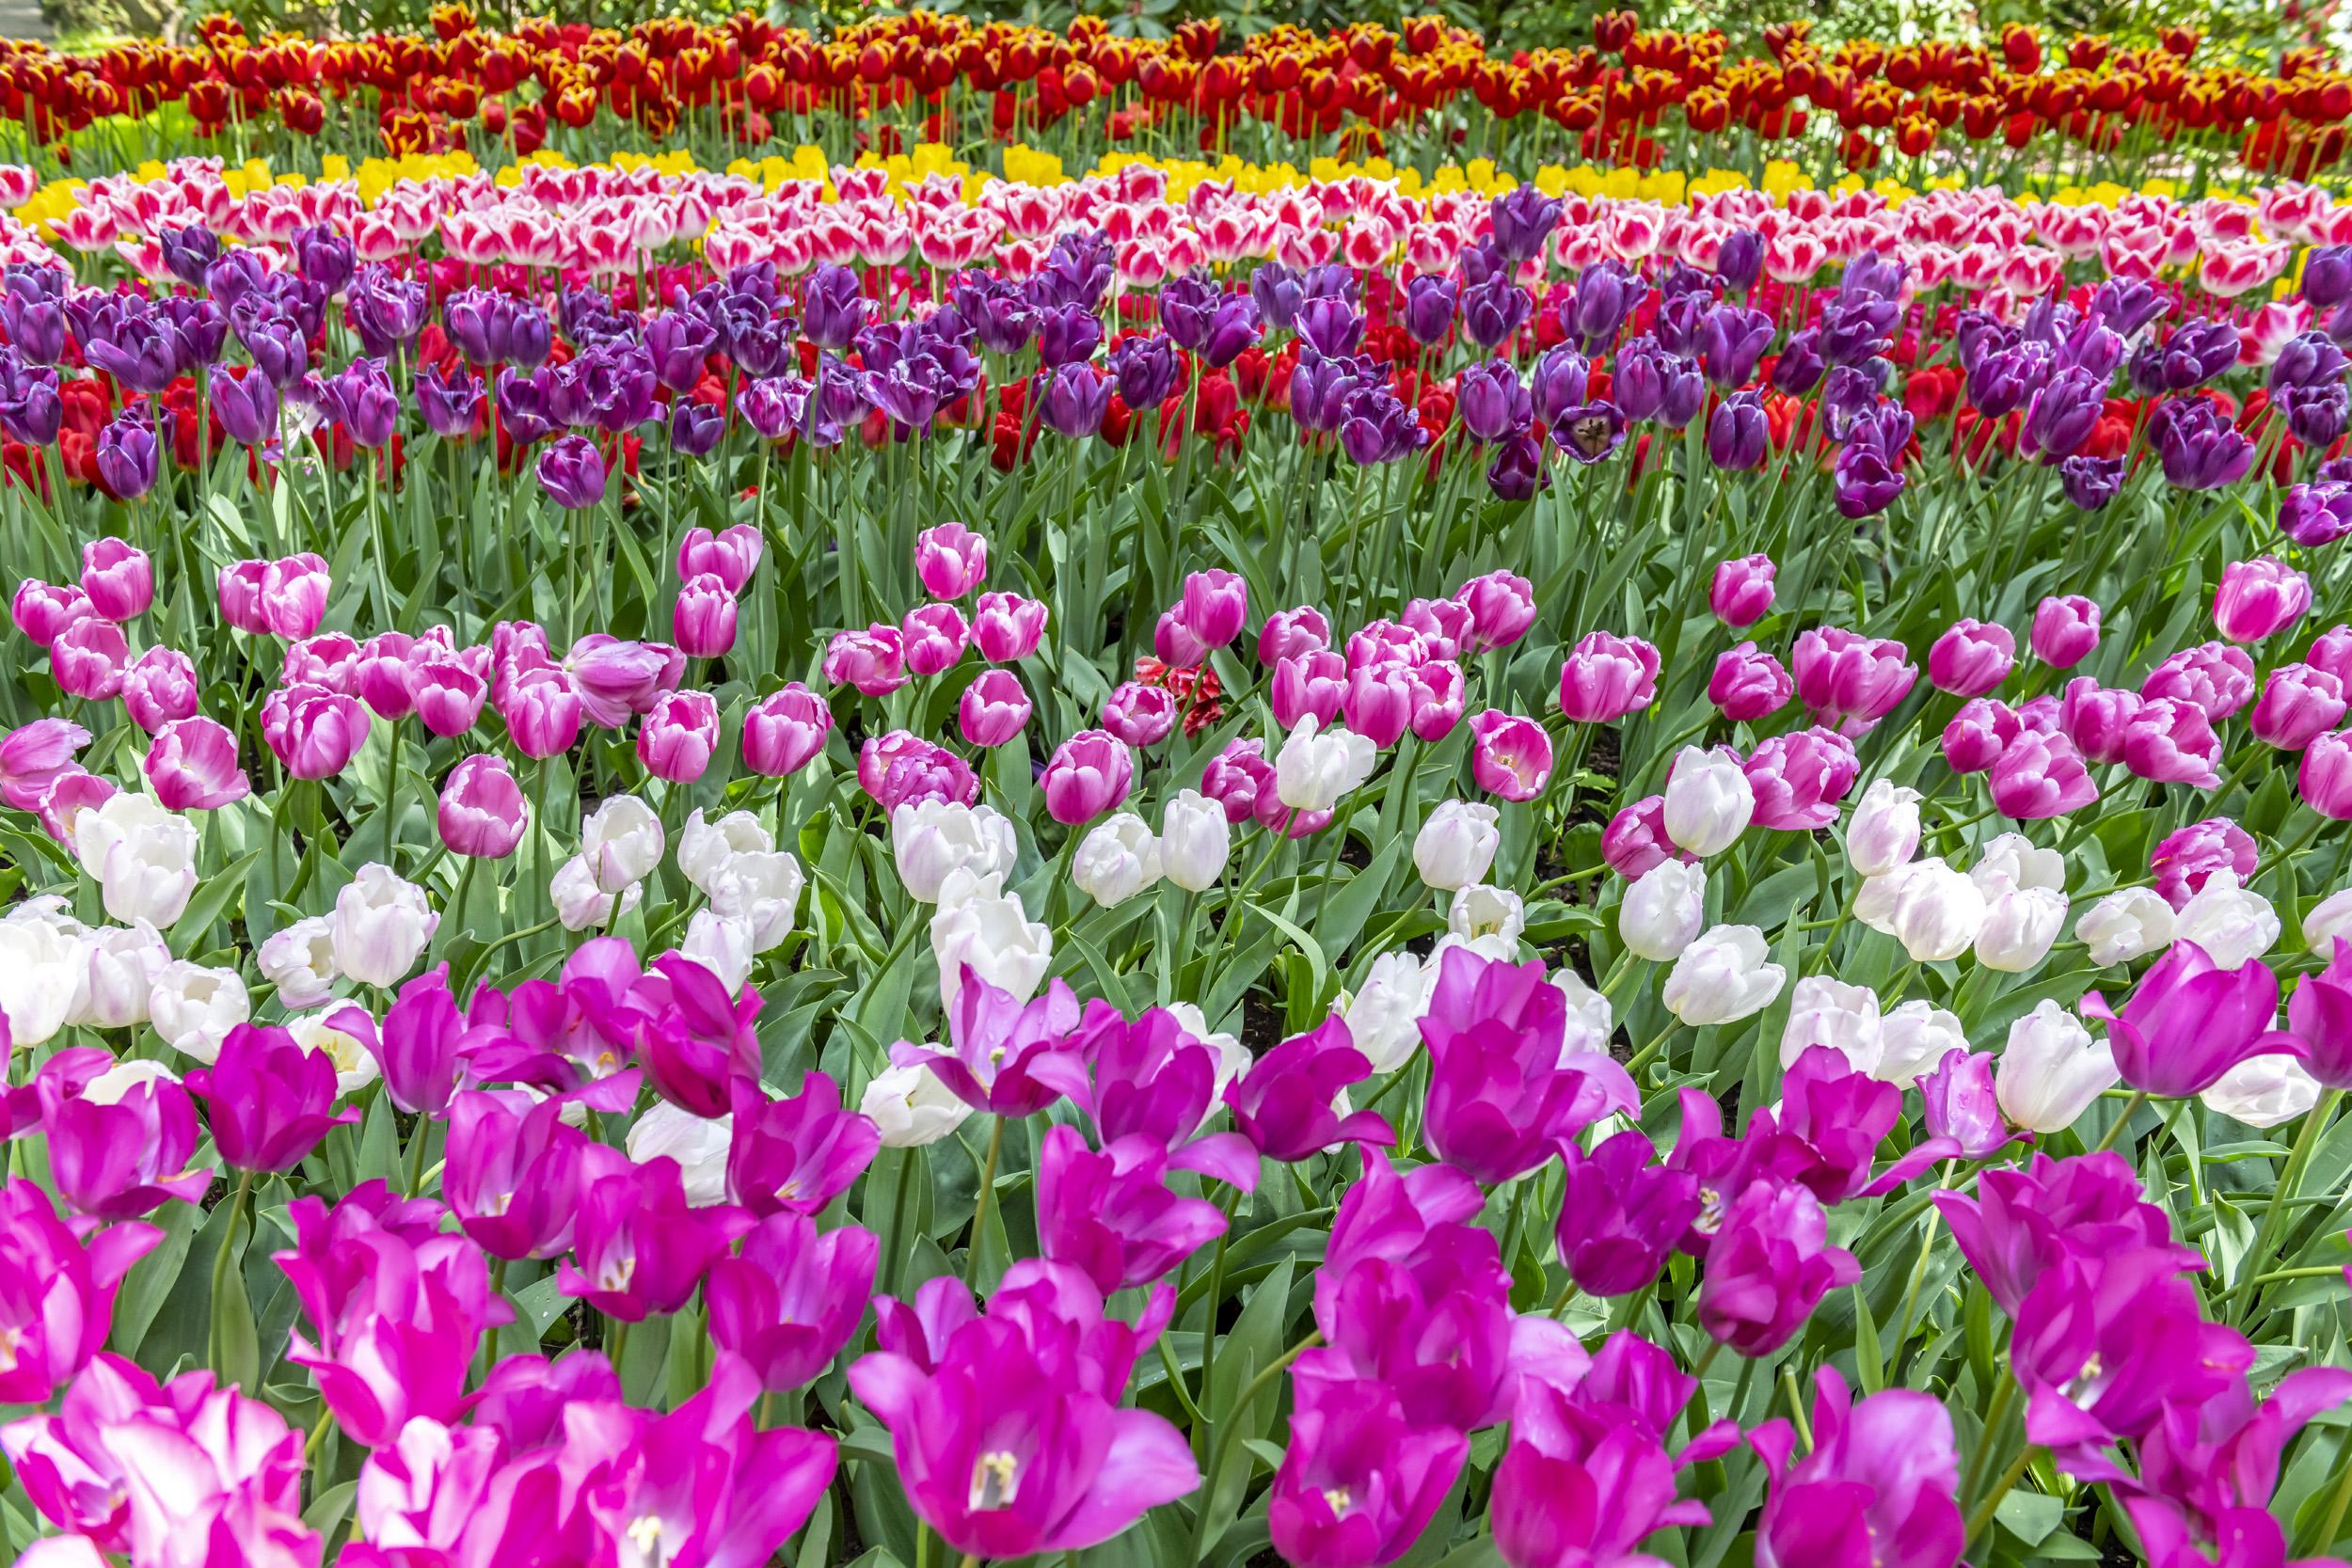 Tulips in Bloom - Kuekenhof, Netherlands